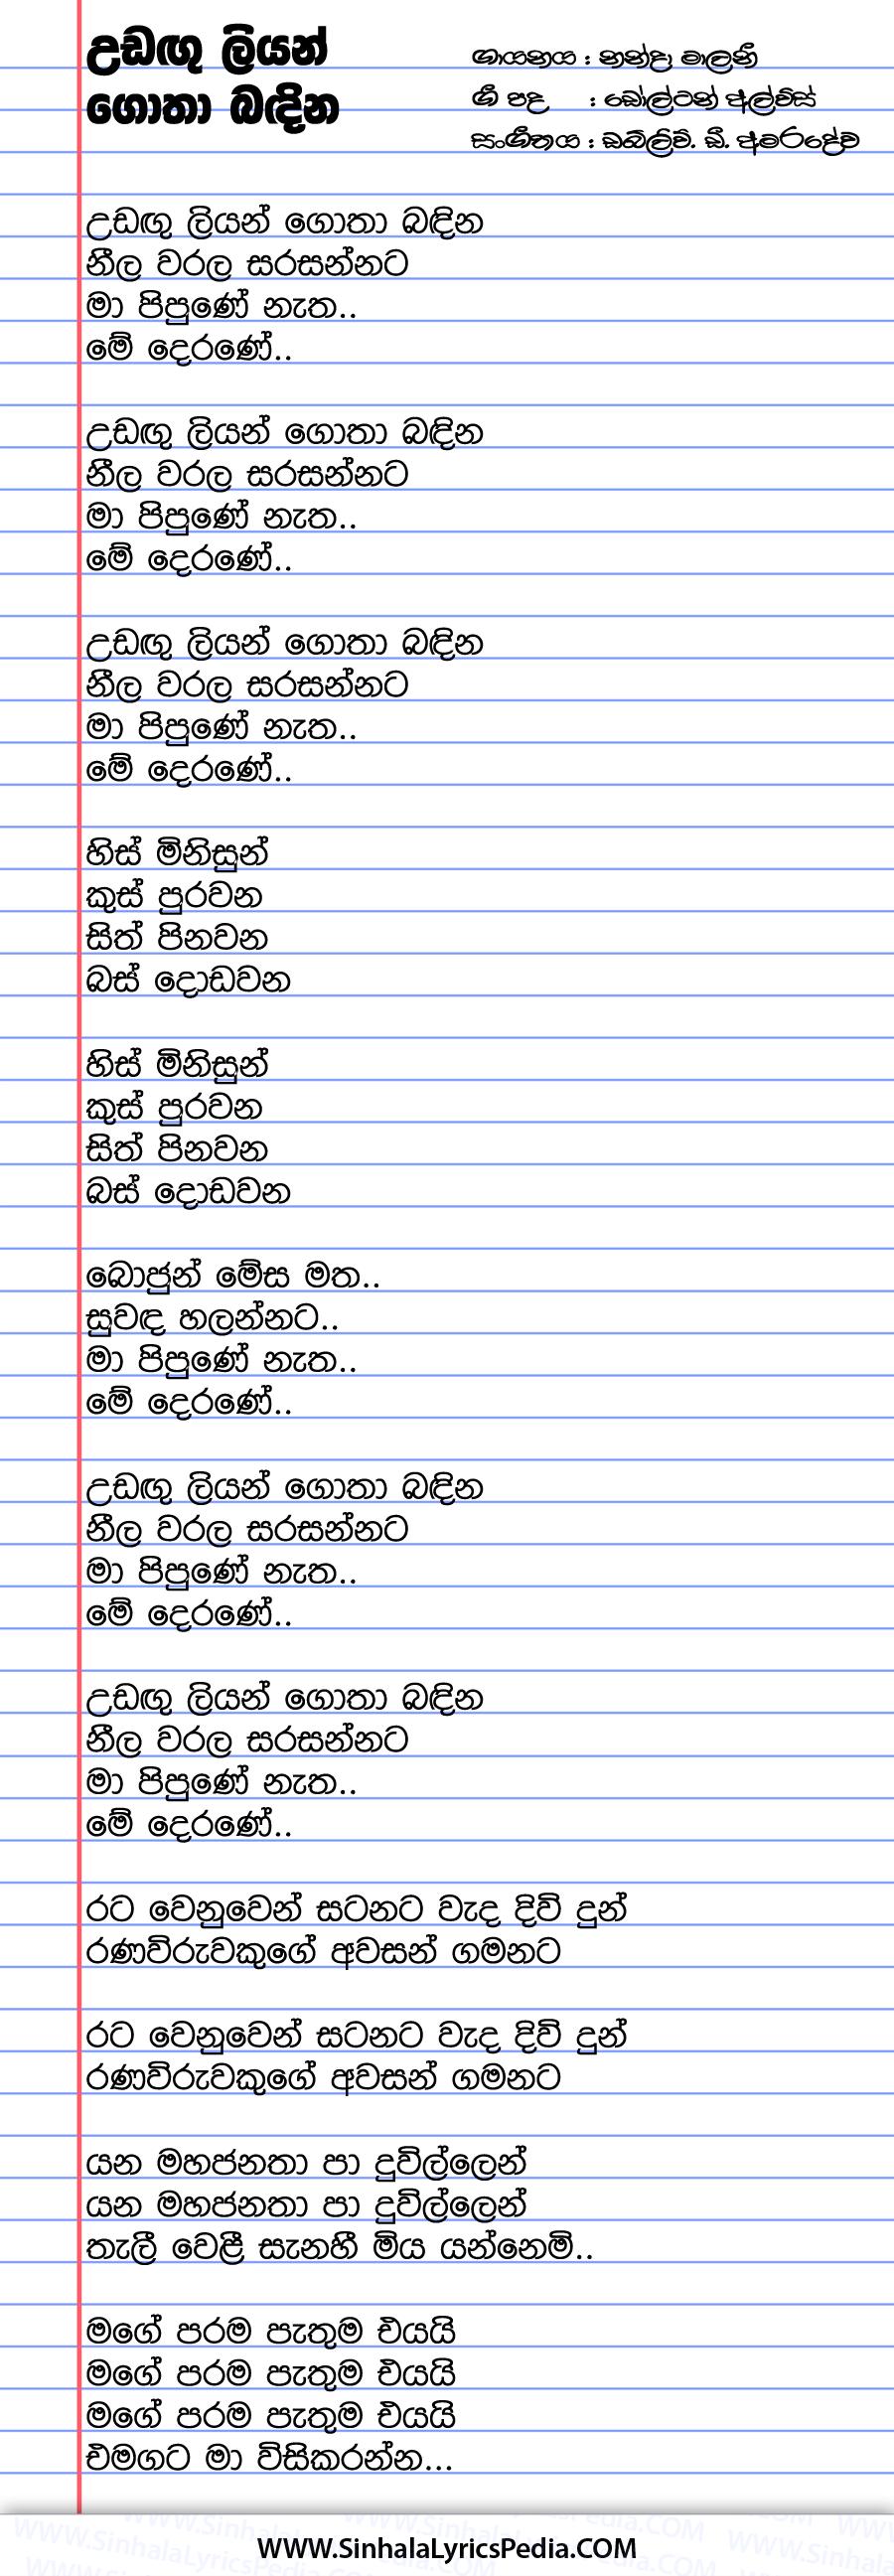 Udagu Liyan Gotha Badina Song Lyrics